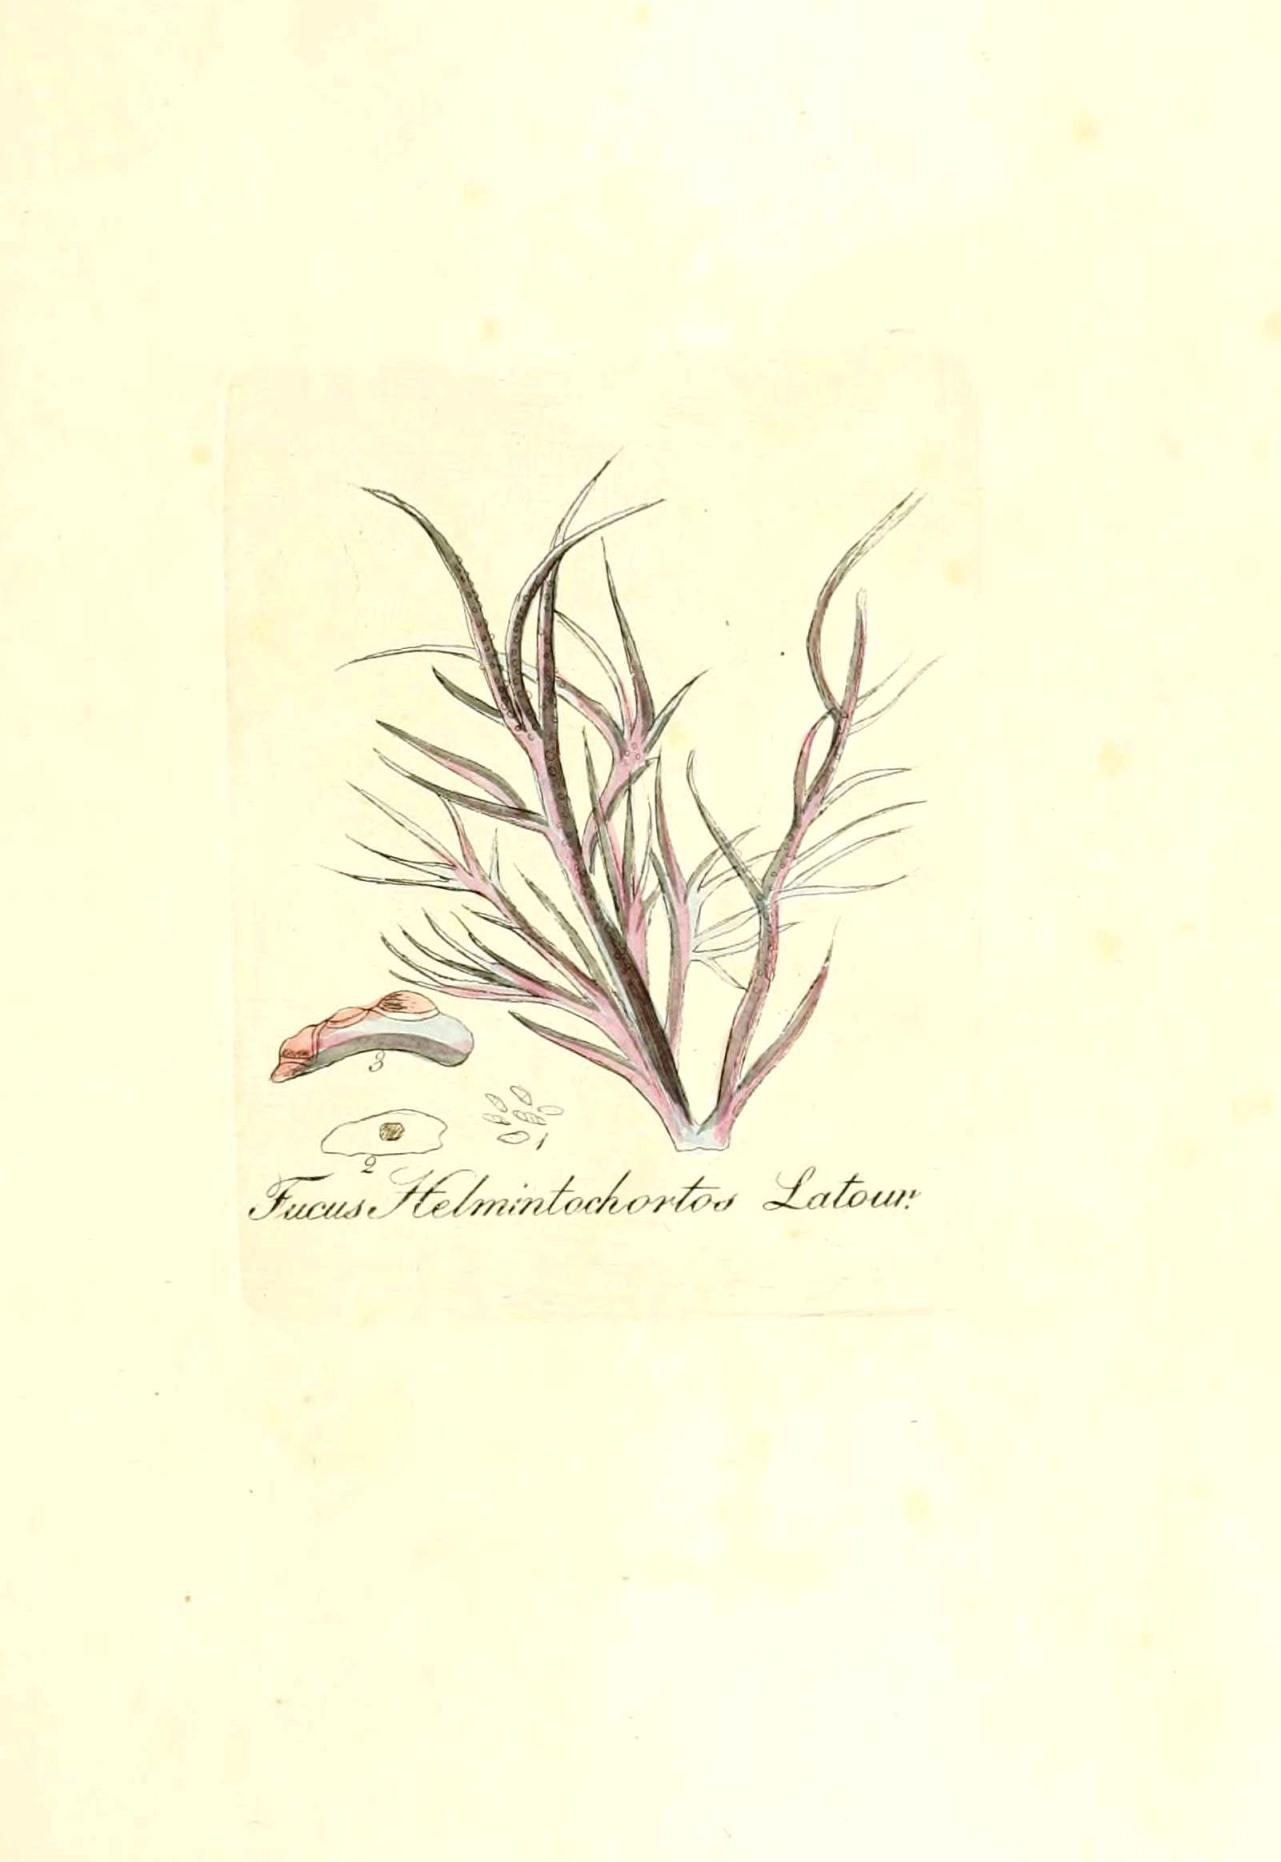 alsidium helminthocorton